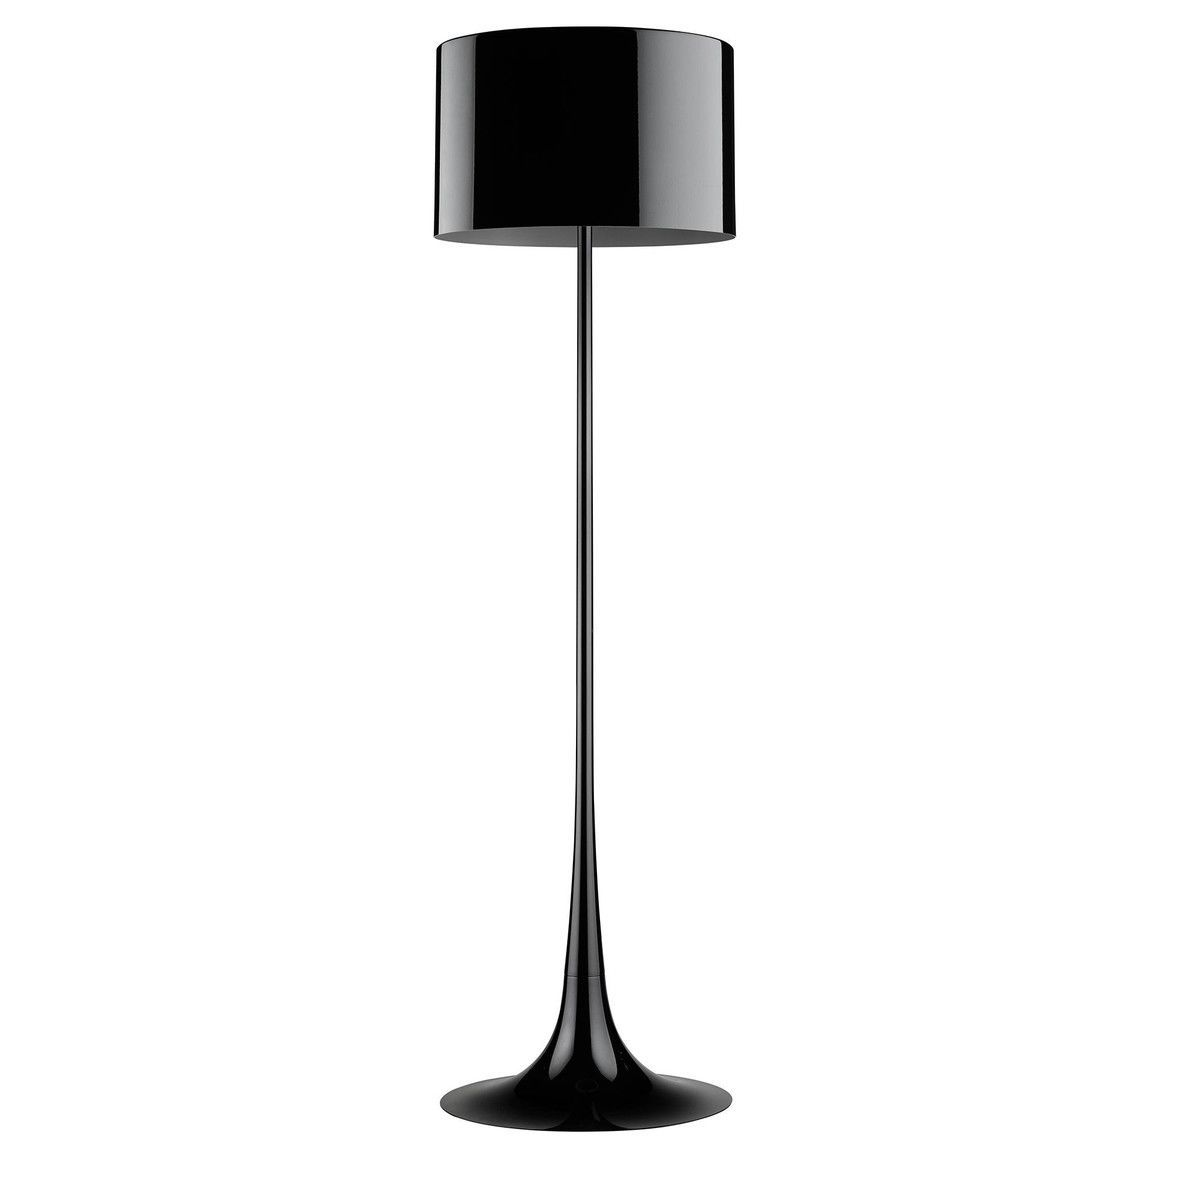 Spun Light F Floor Lamp | Flos | AmbienteDirect.com for Flos Spun Table Lamp  56bof